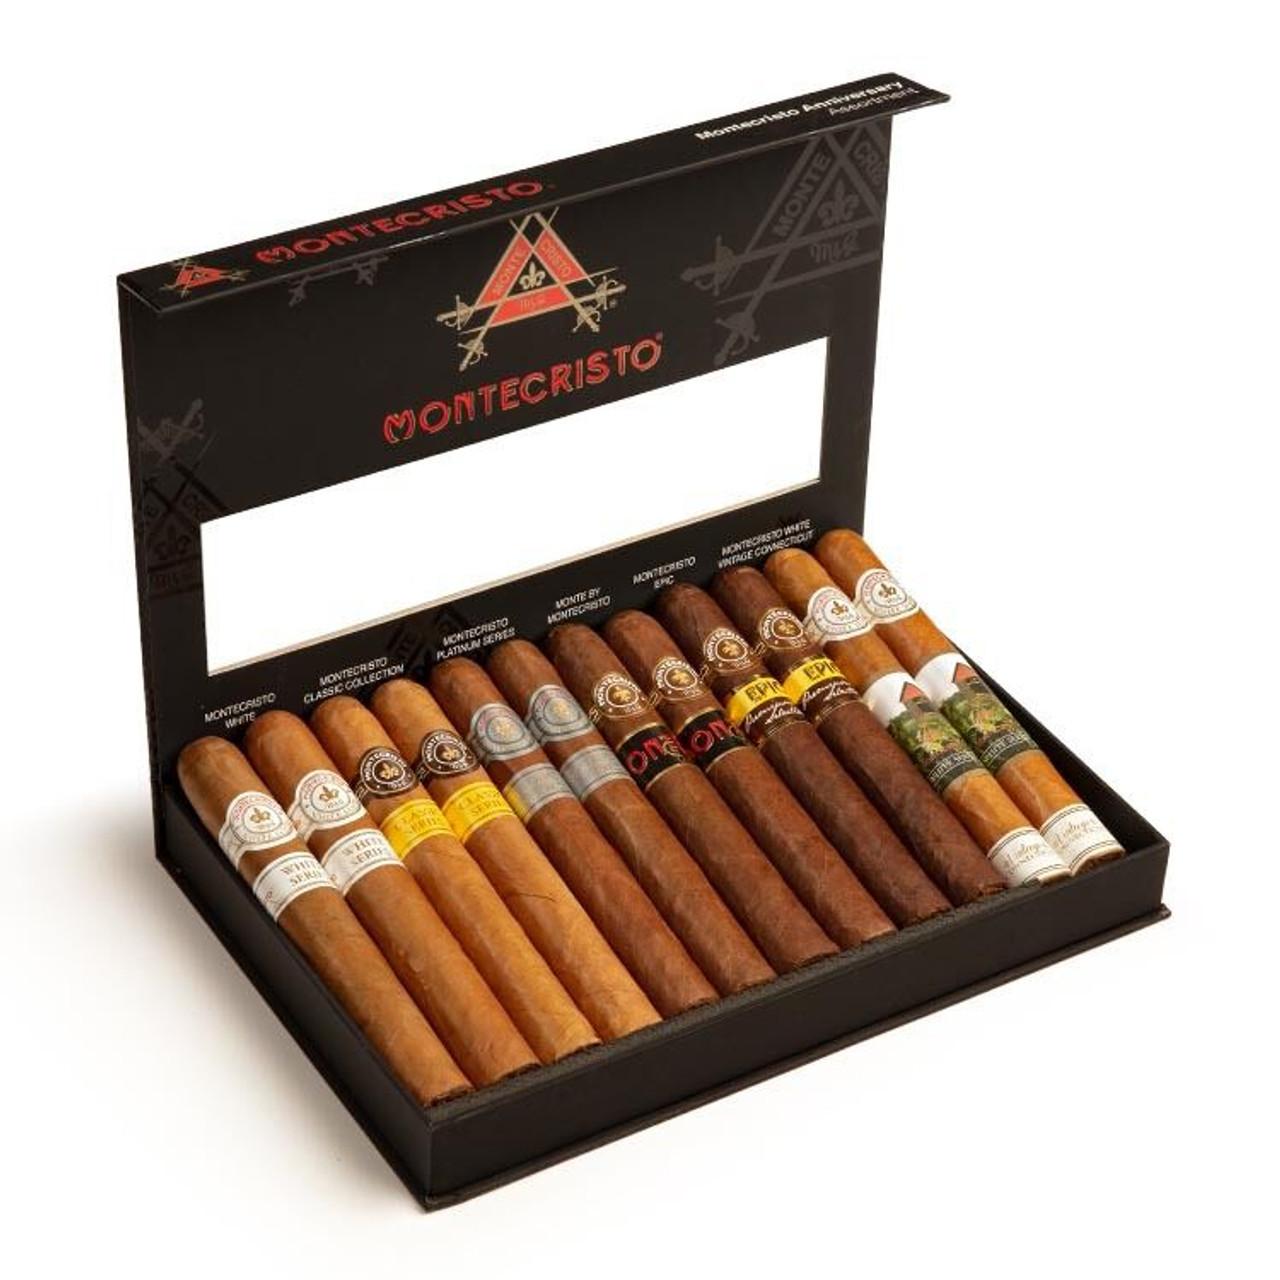 Cigar Samplers Montecristo 12-Cigar Sampler Cigars (Box of 12)